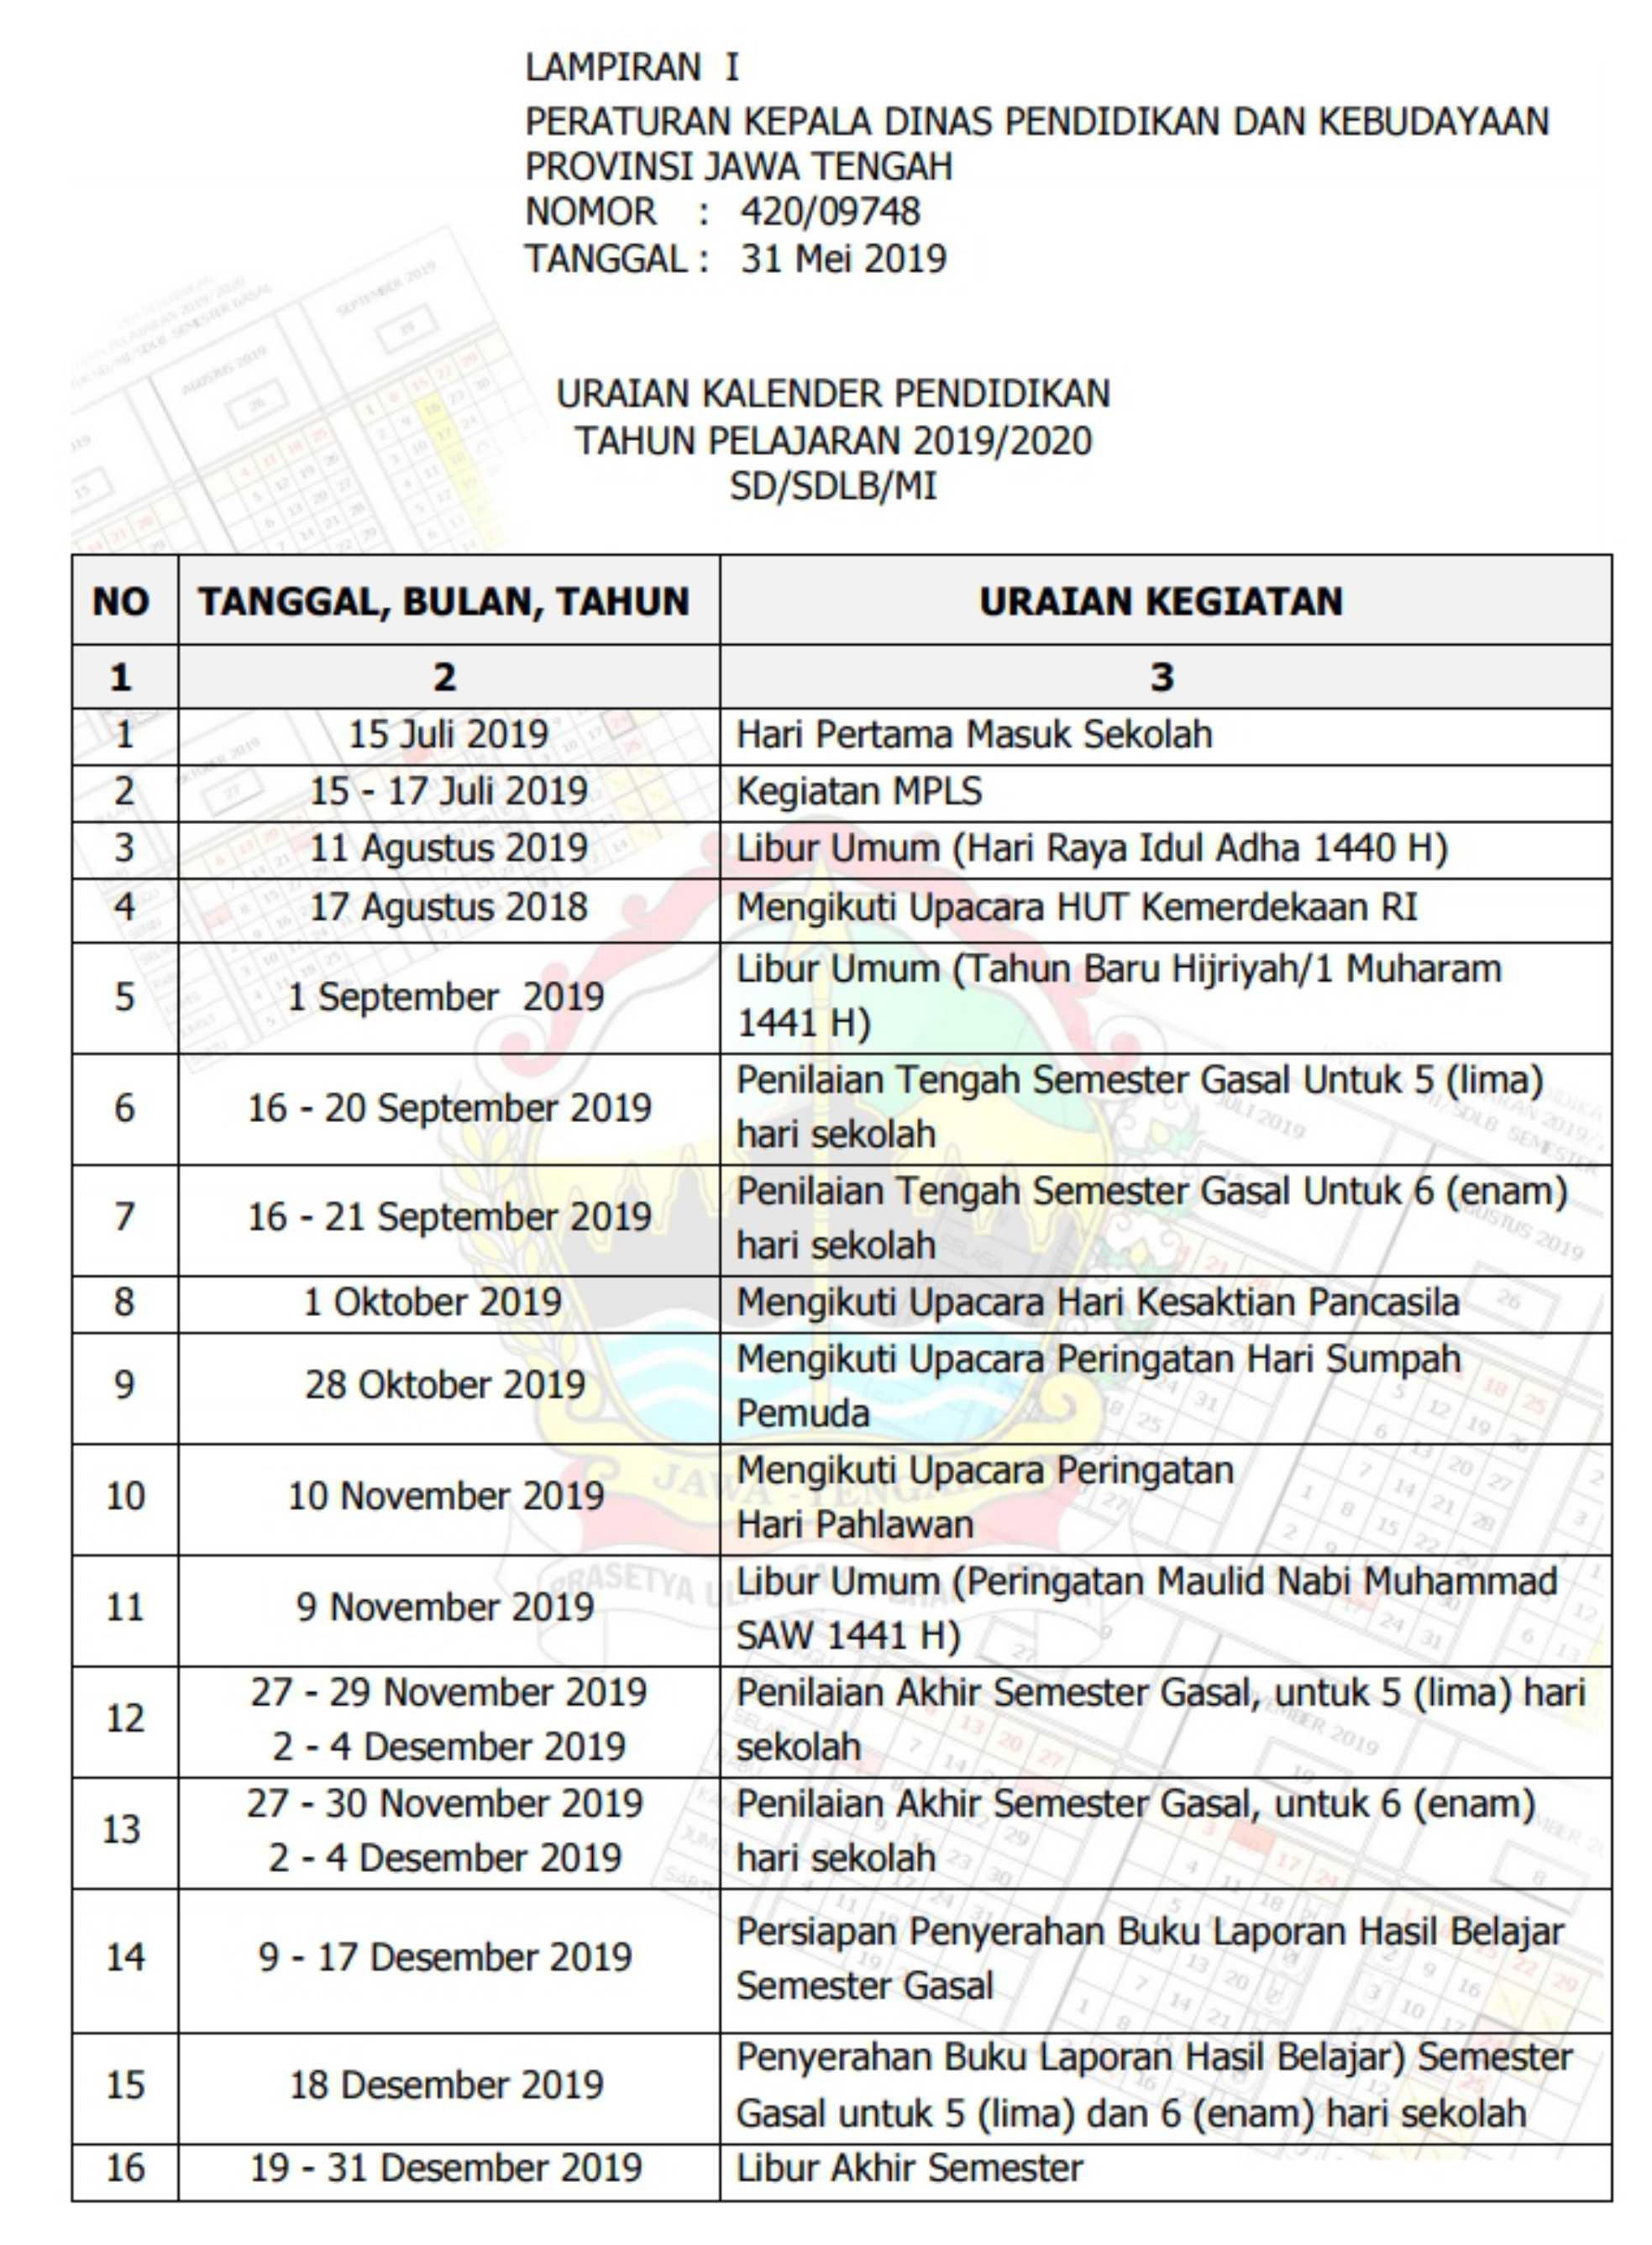 uraian kalender pendidikan tahun pelajaran 2019 - 2020 SD SDLB MI provinsi jawa tengah